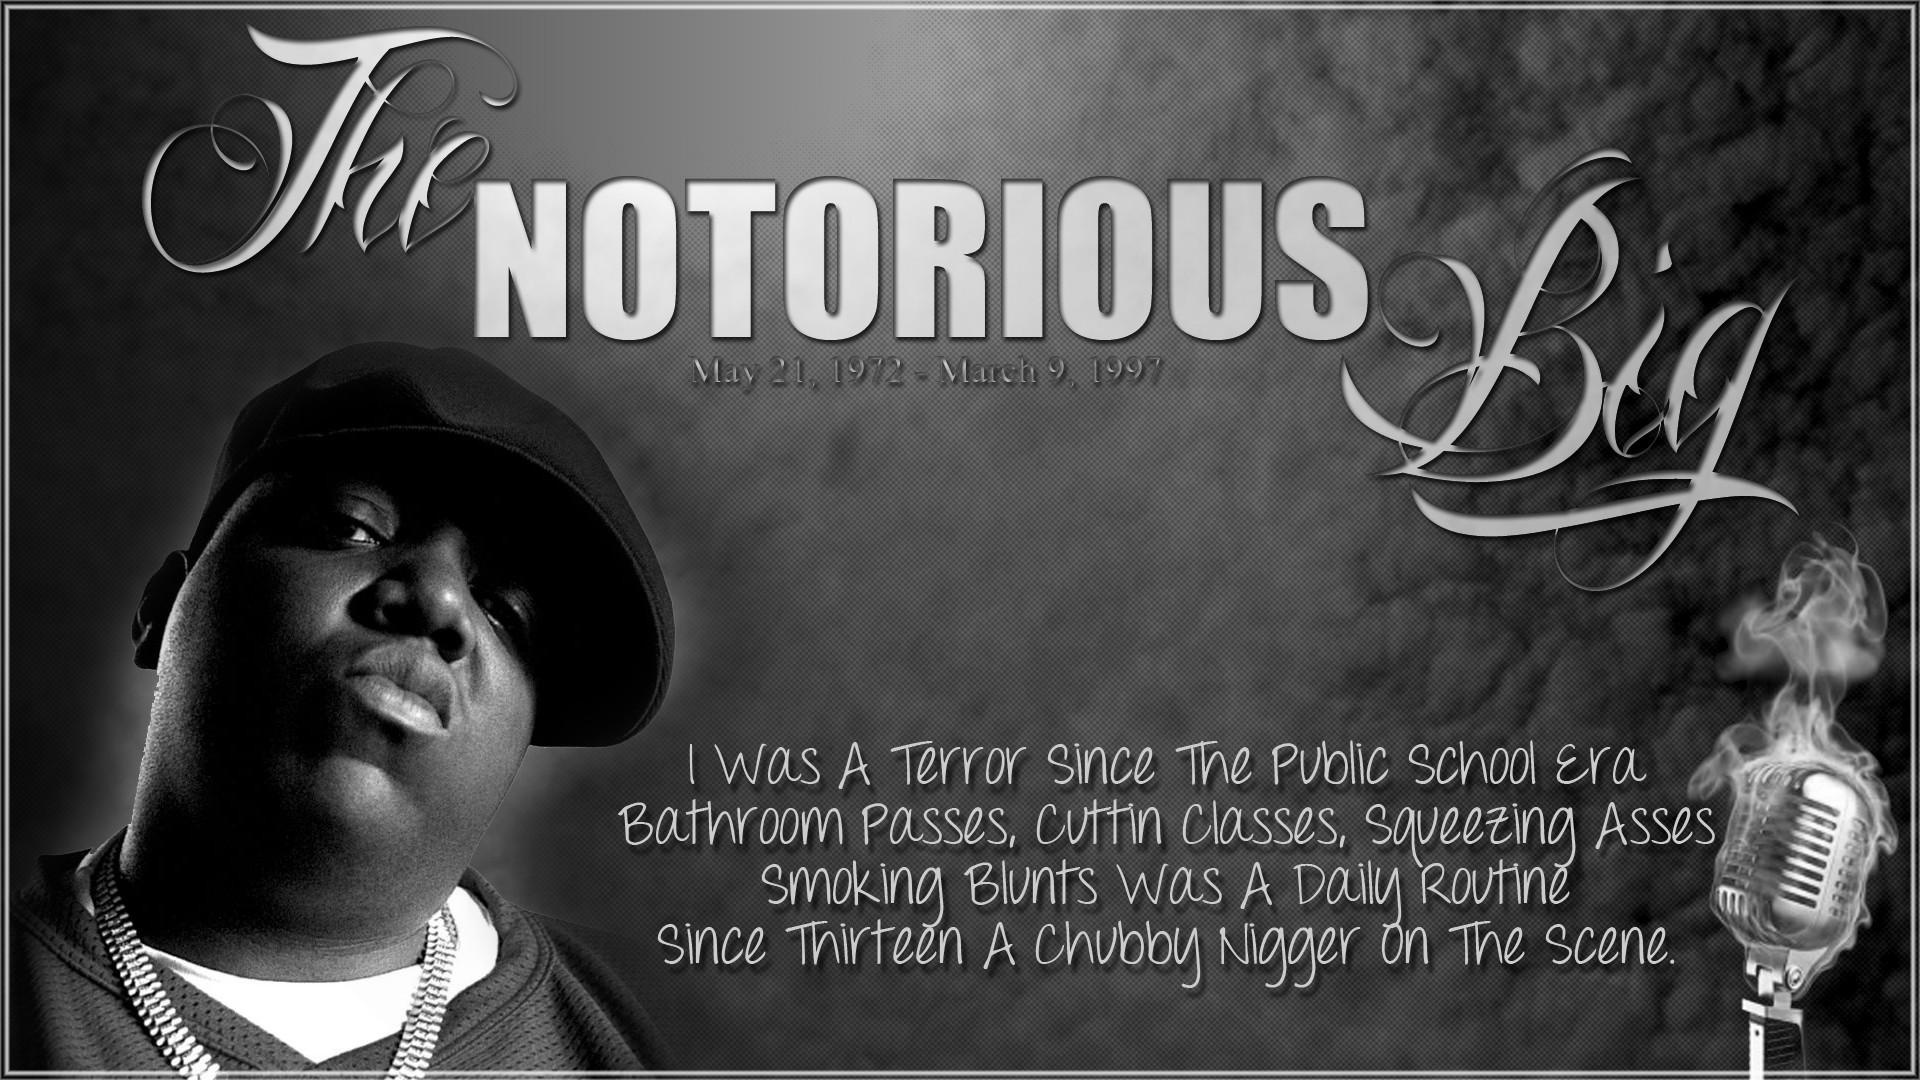 Metro gangsta rap full movie - 4 1